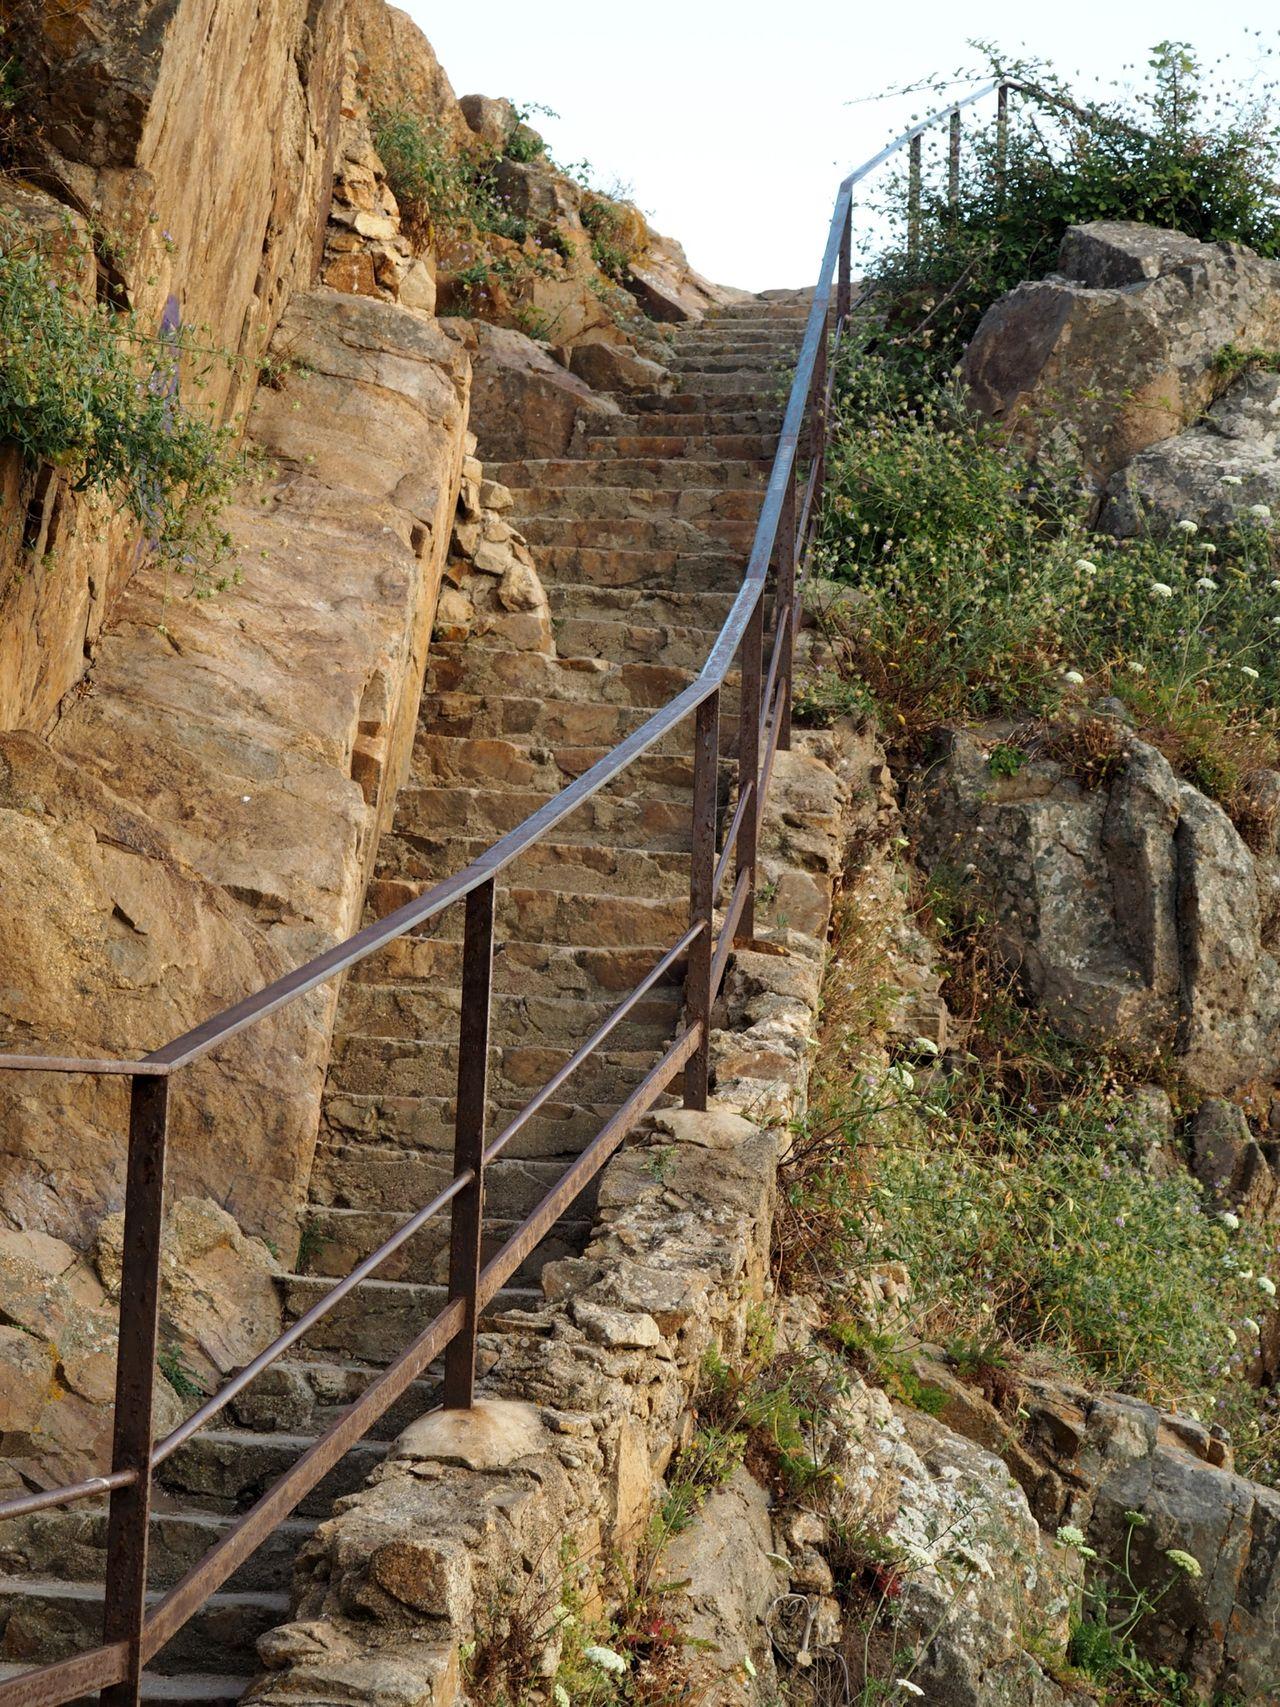 Plants Ladder Stears Stones Old Banister